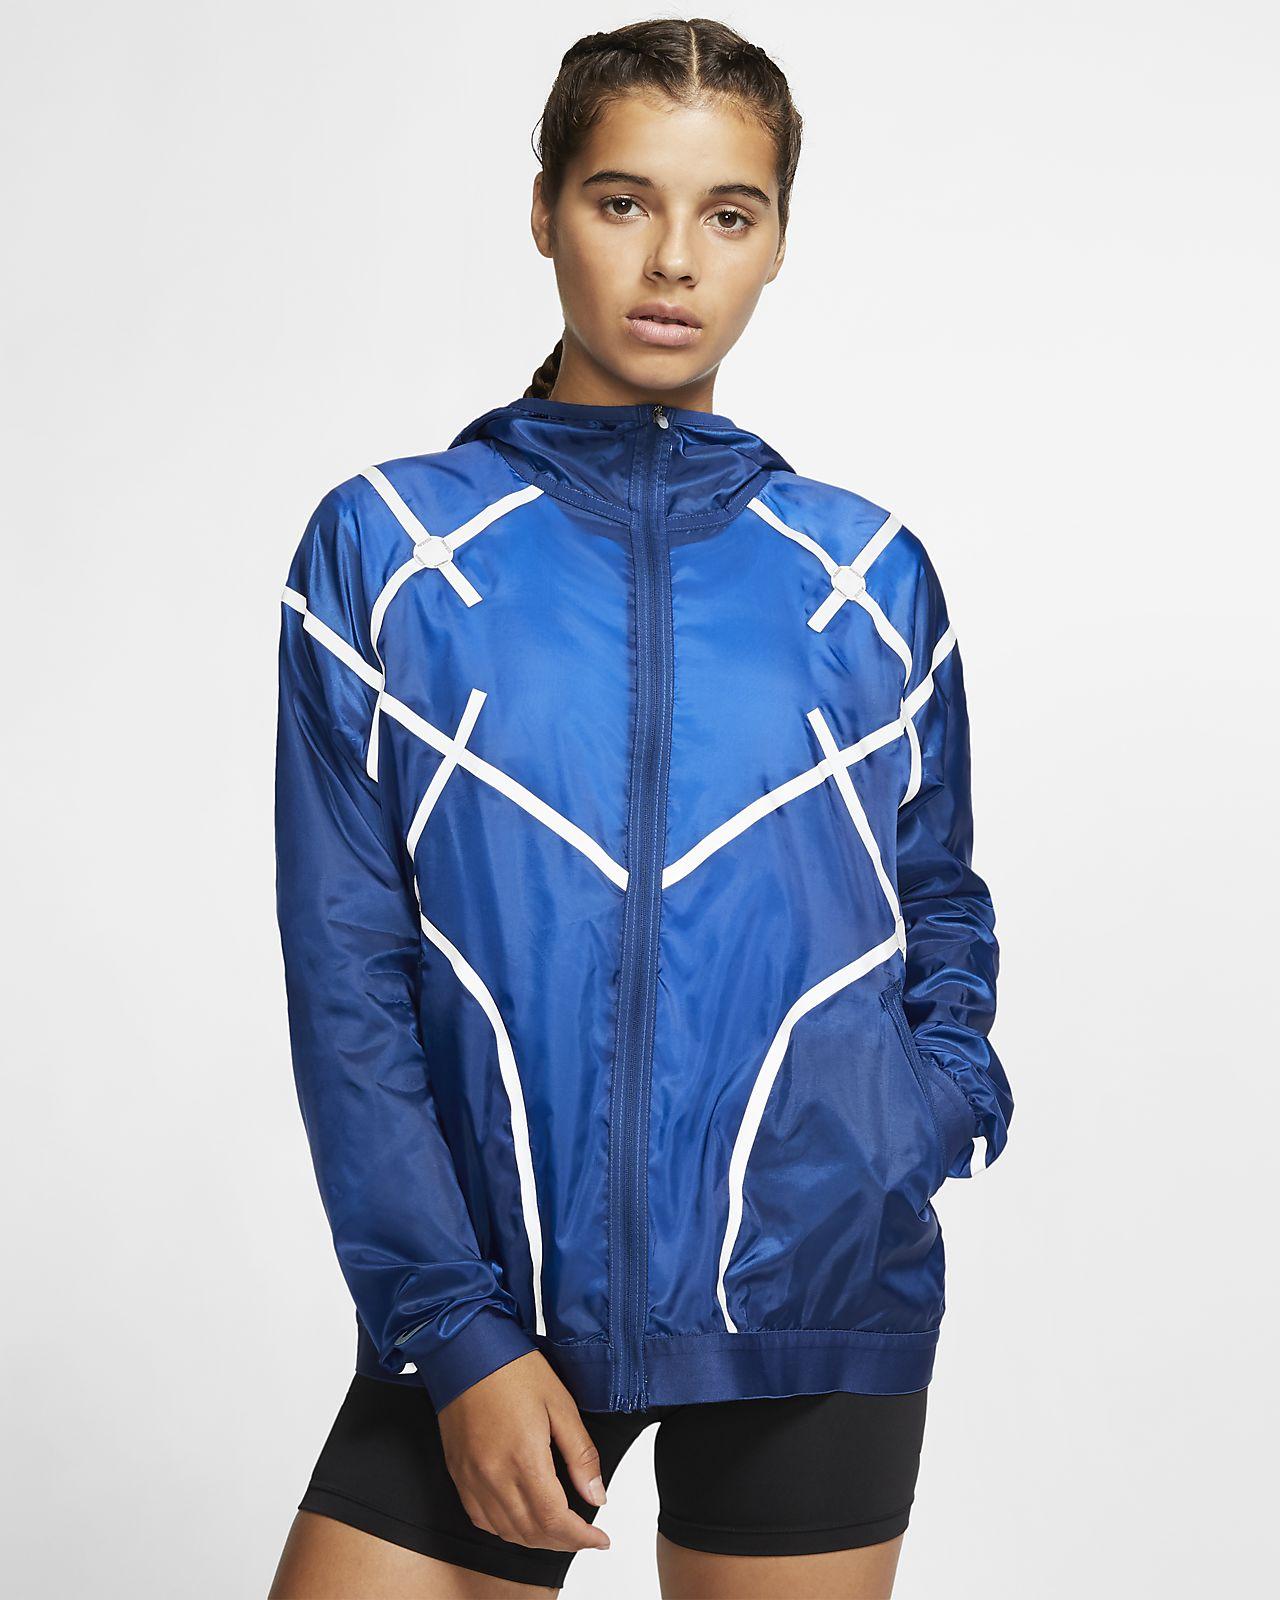 Nike City Ready Women's Hooded Running Jacket